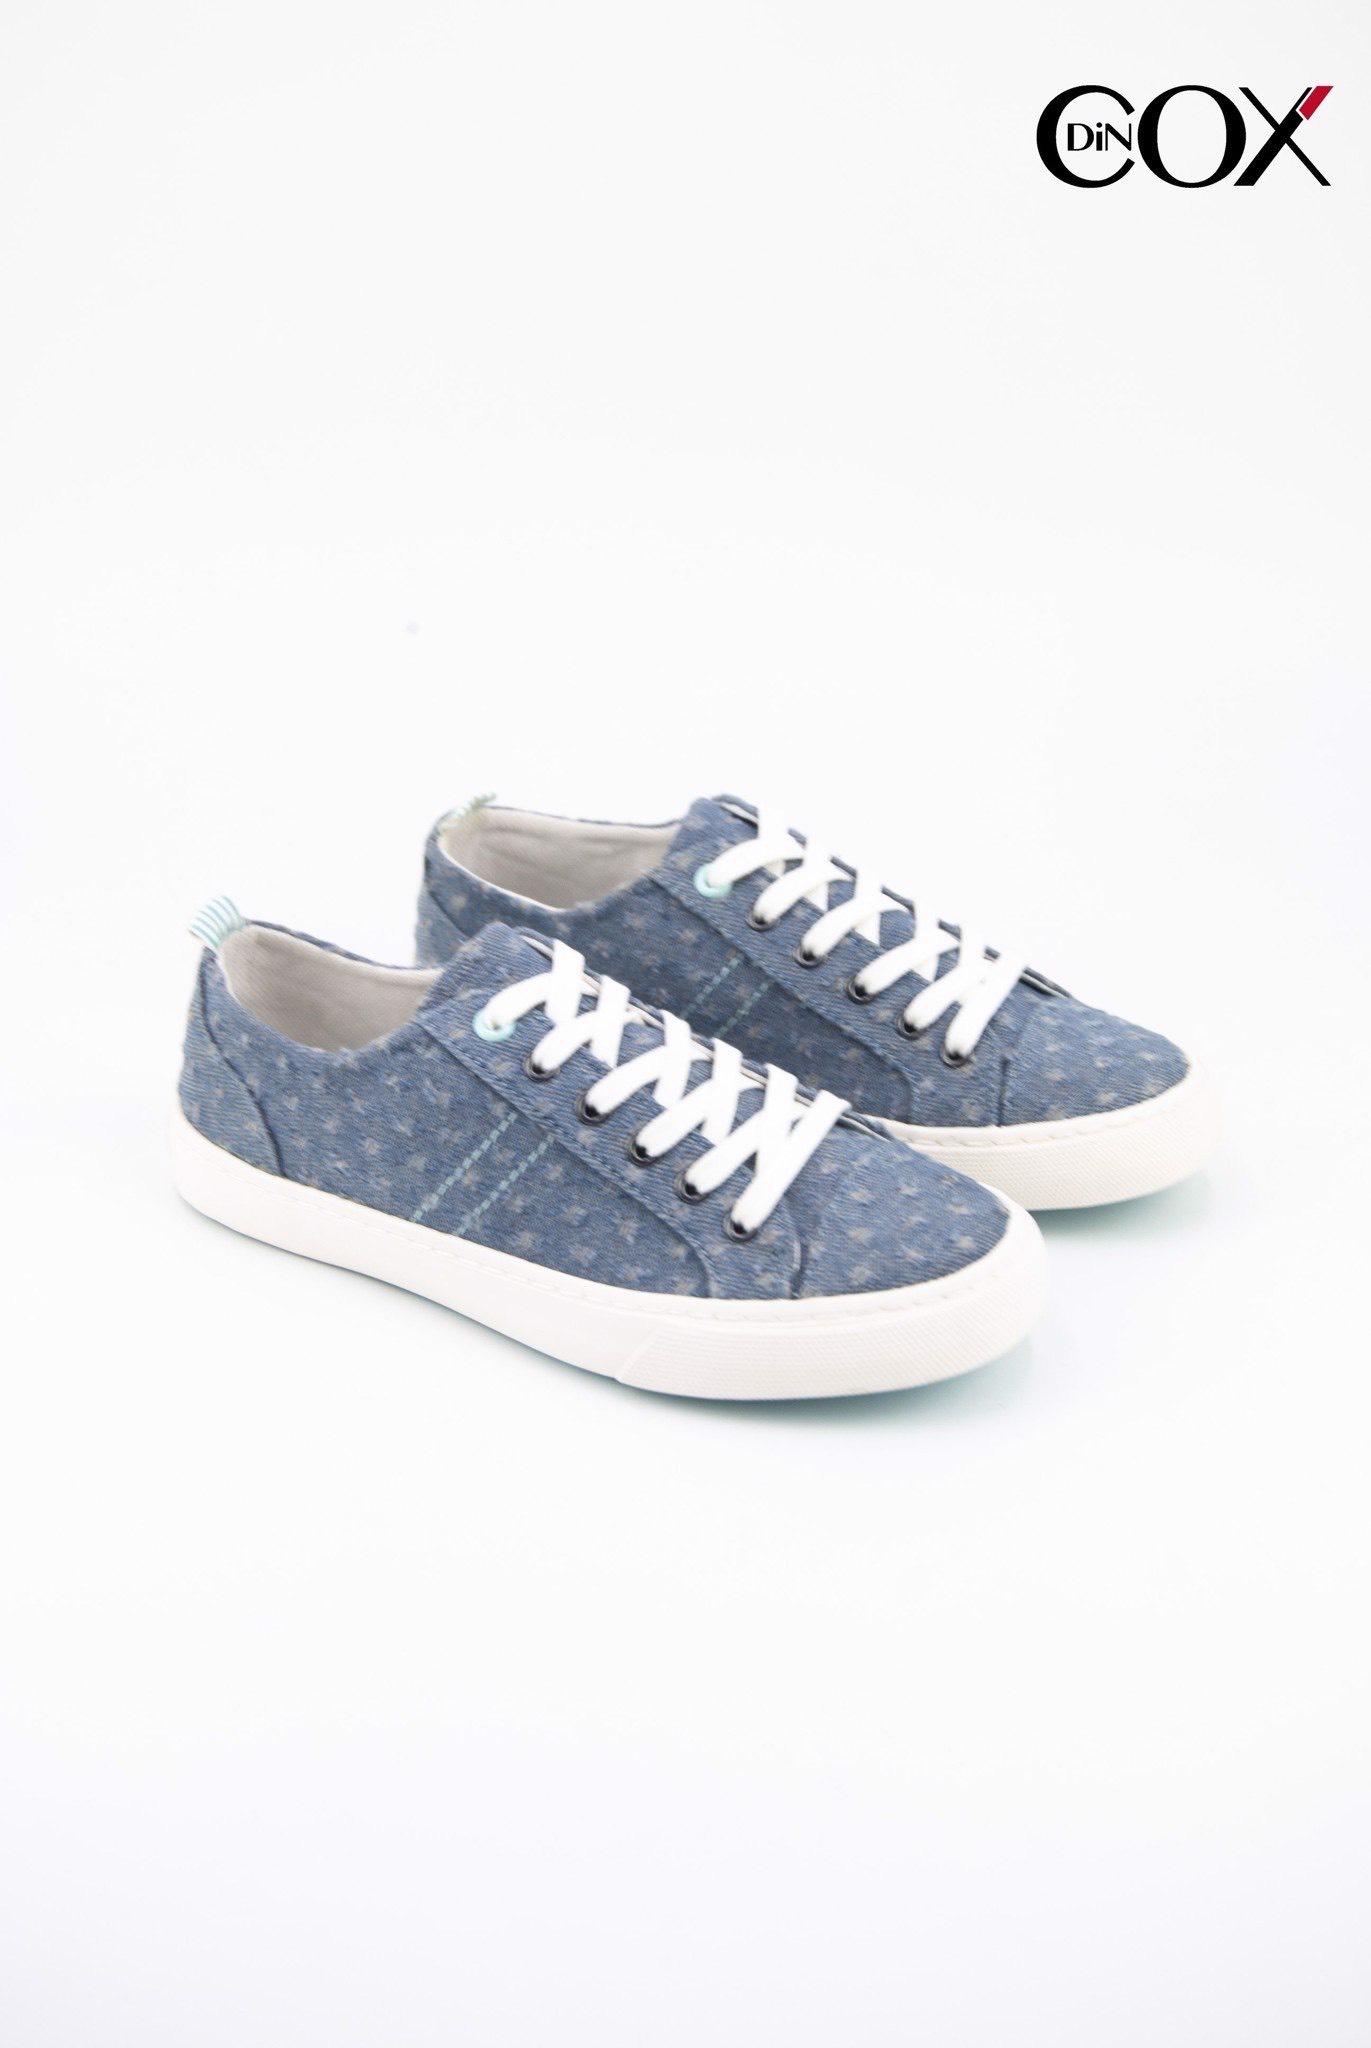 dincox3656-blue